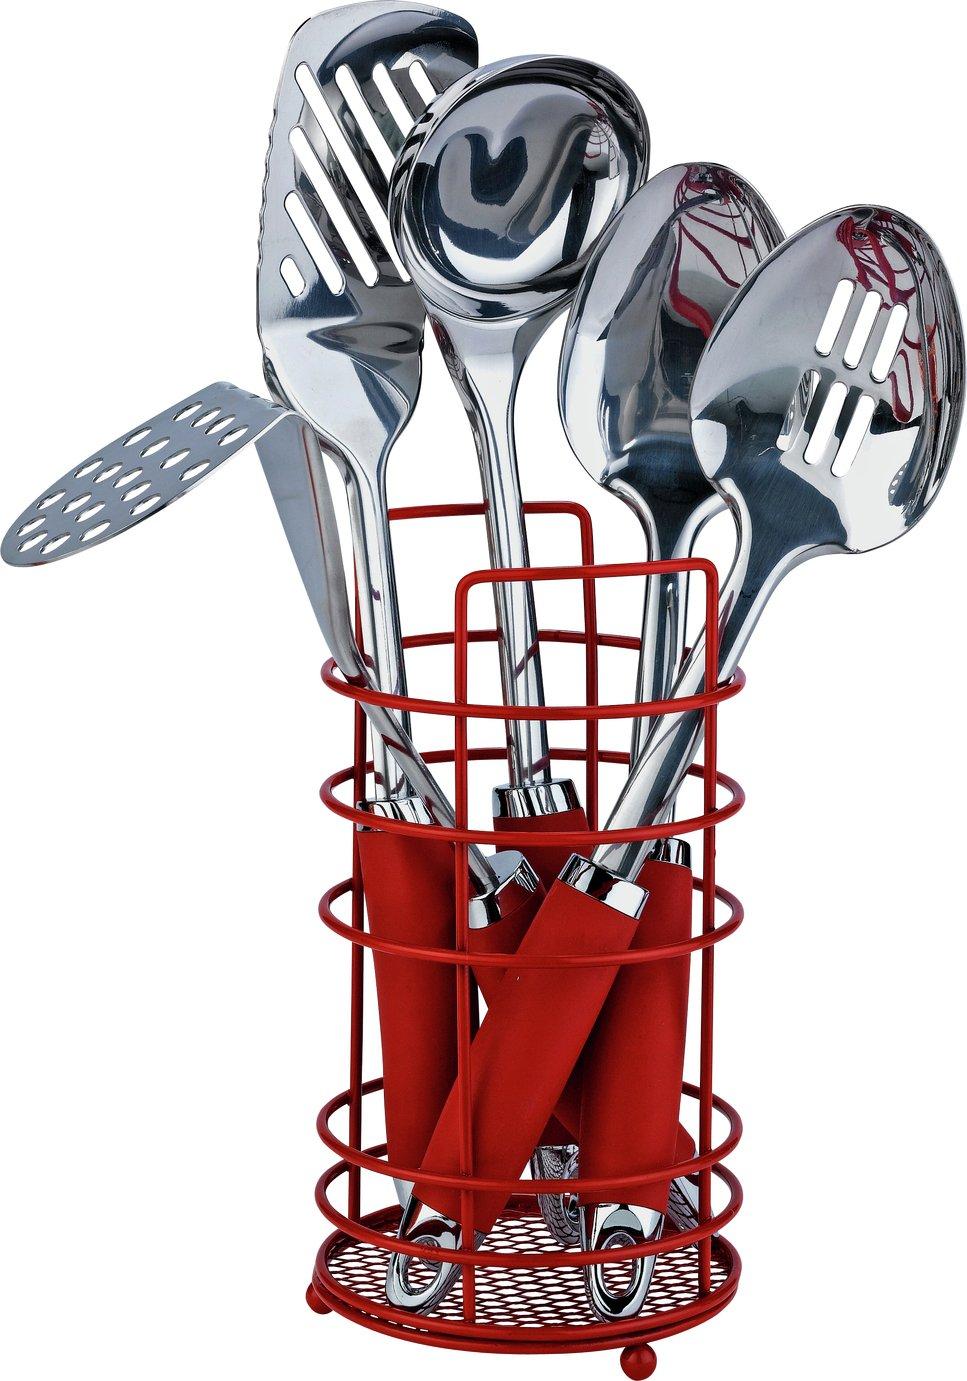 Argos Home Stainless Steel 5 Pc Kitchen Utensil Set - Red